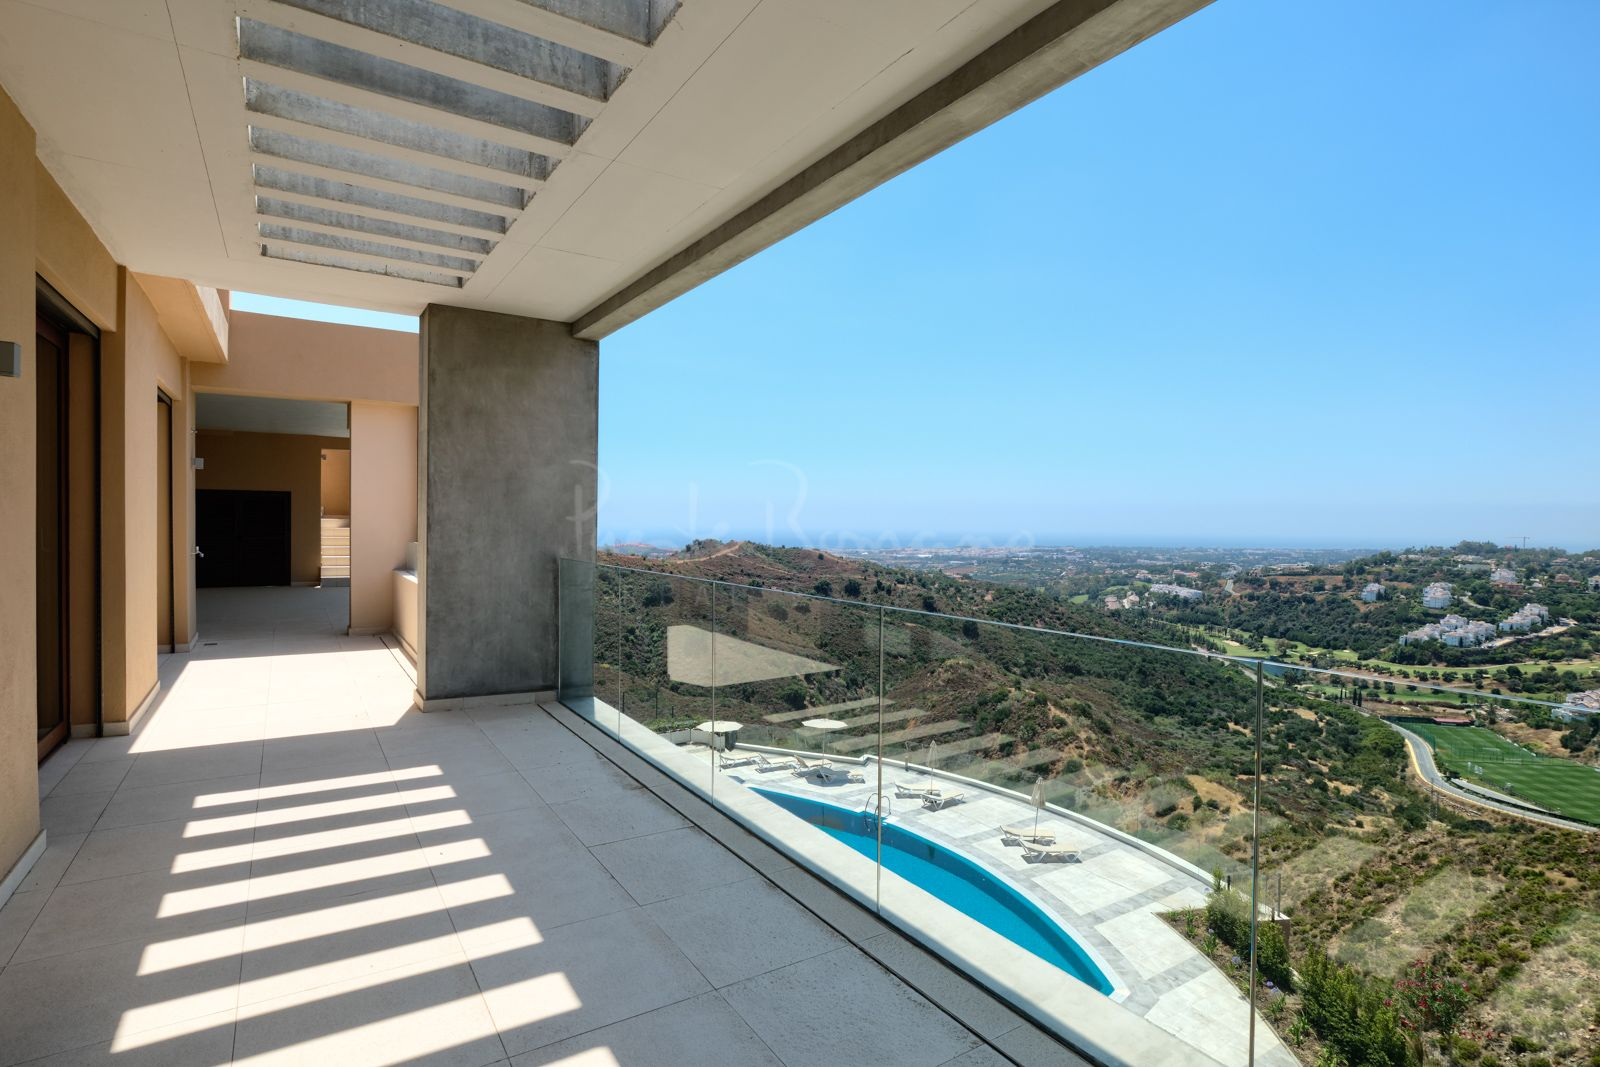 Penthouse in Real de La Quinta, Benahavis